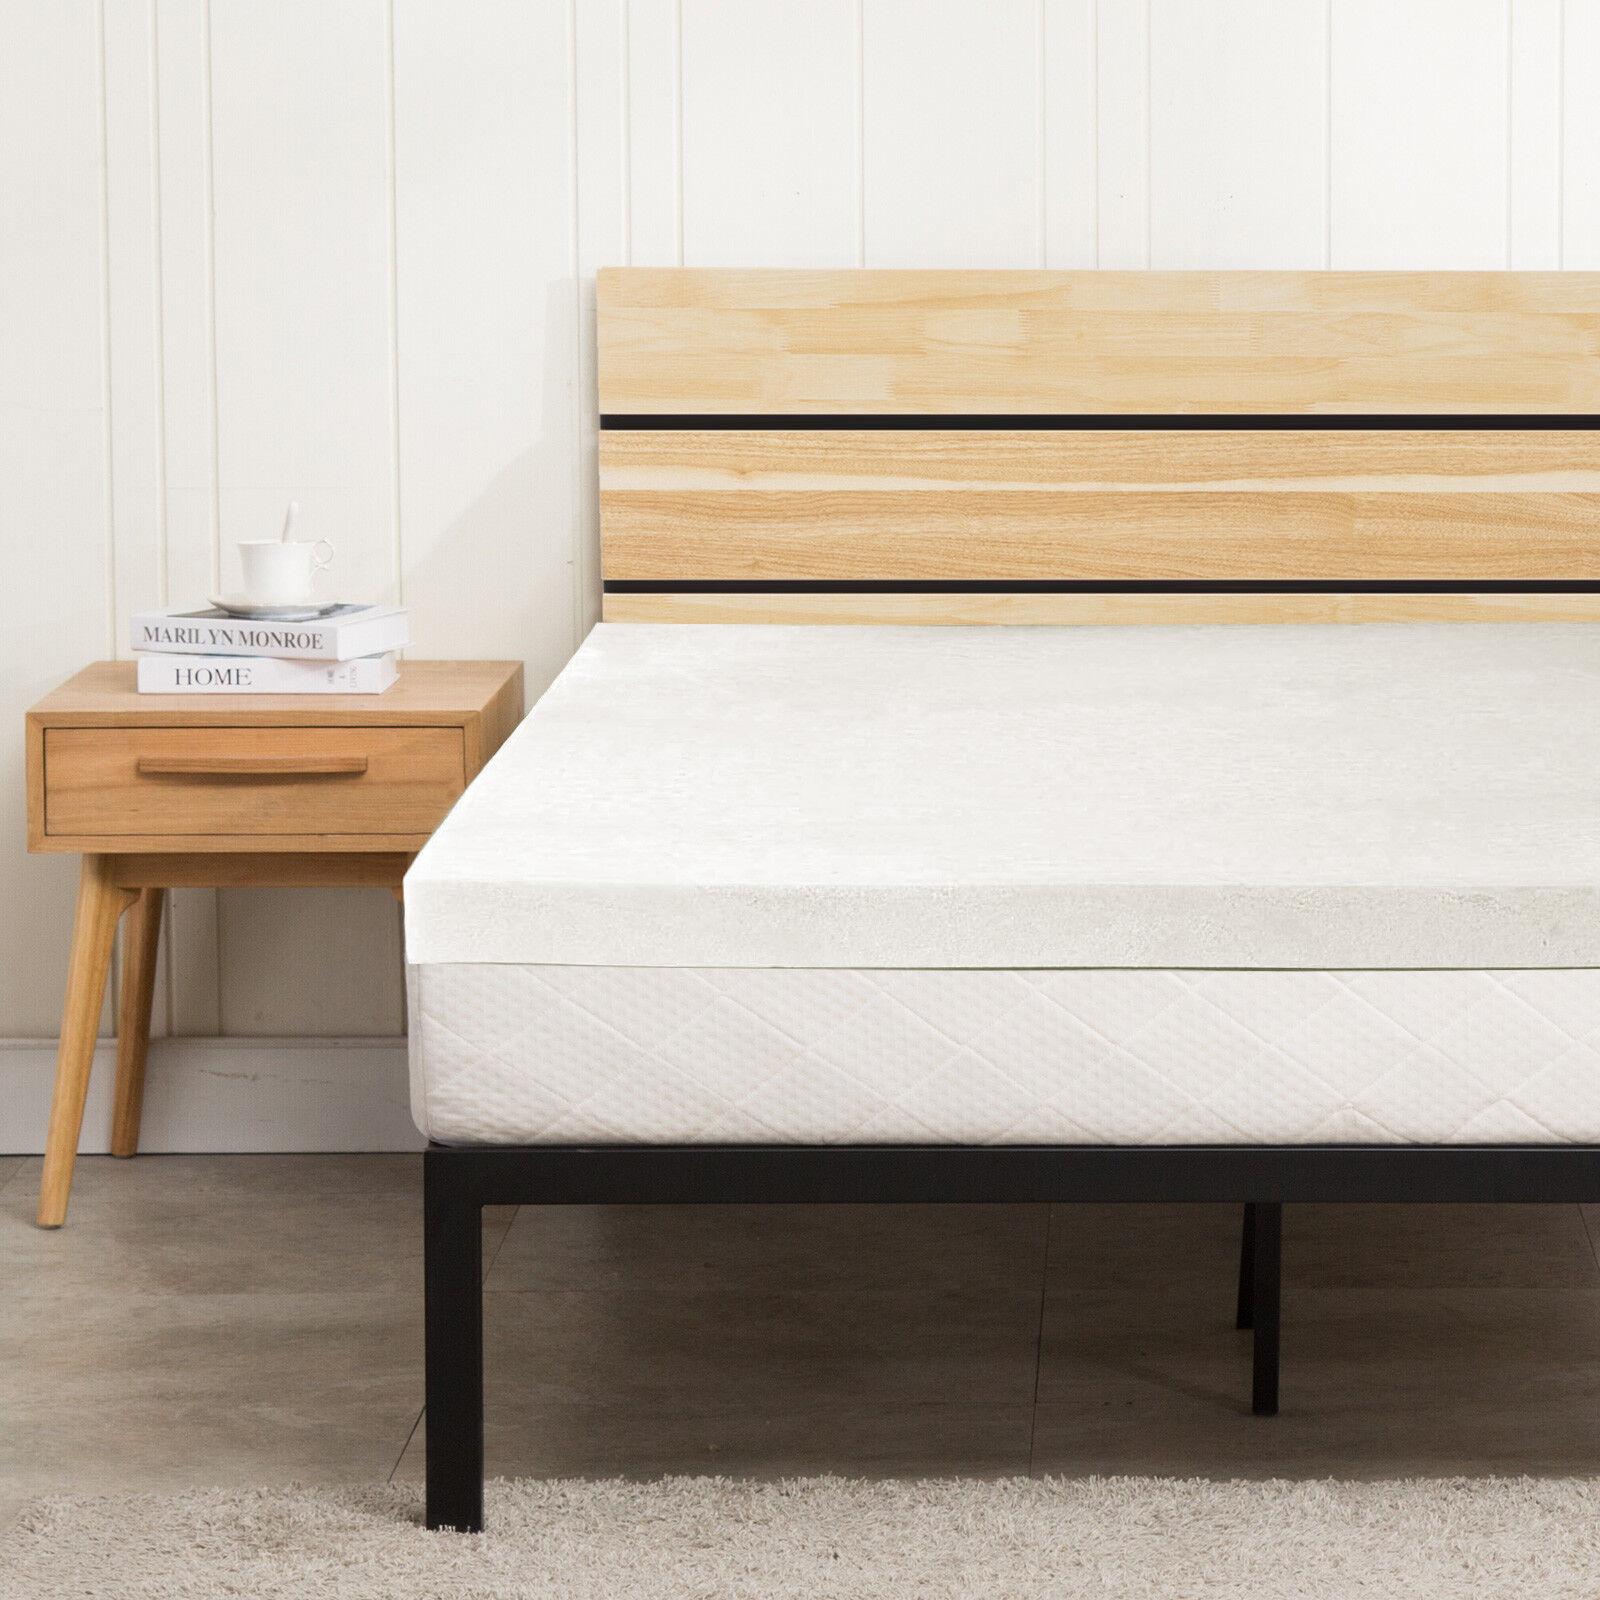 2 uenjoy comfort memory foam mattress topper twin twin xl full queen king ebay. Black Bedroom Furniture Sets. Home Design Ideas